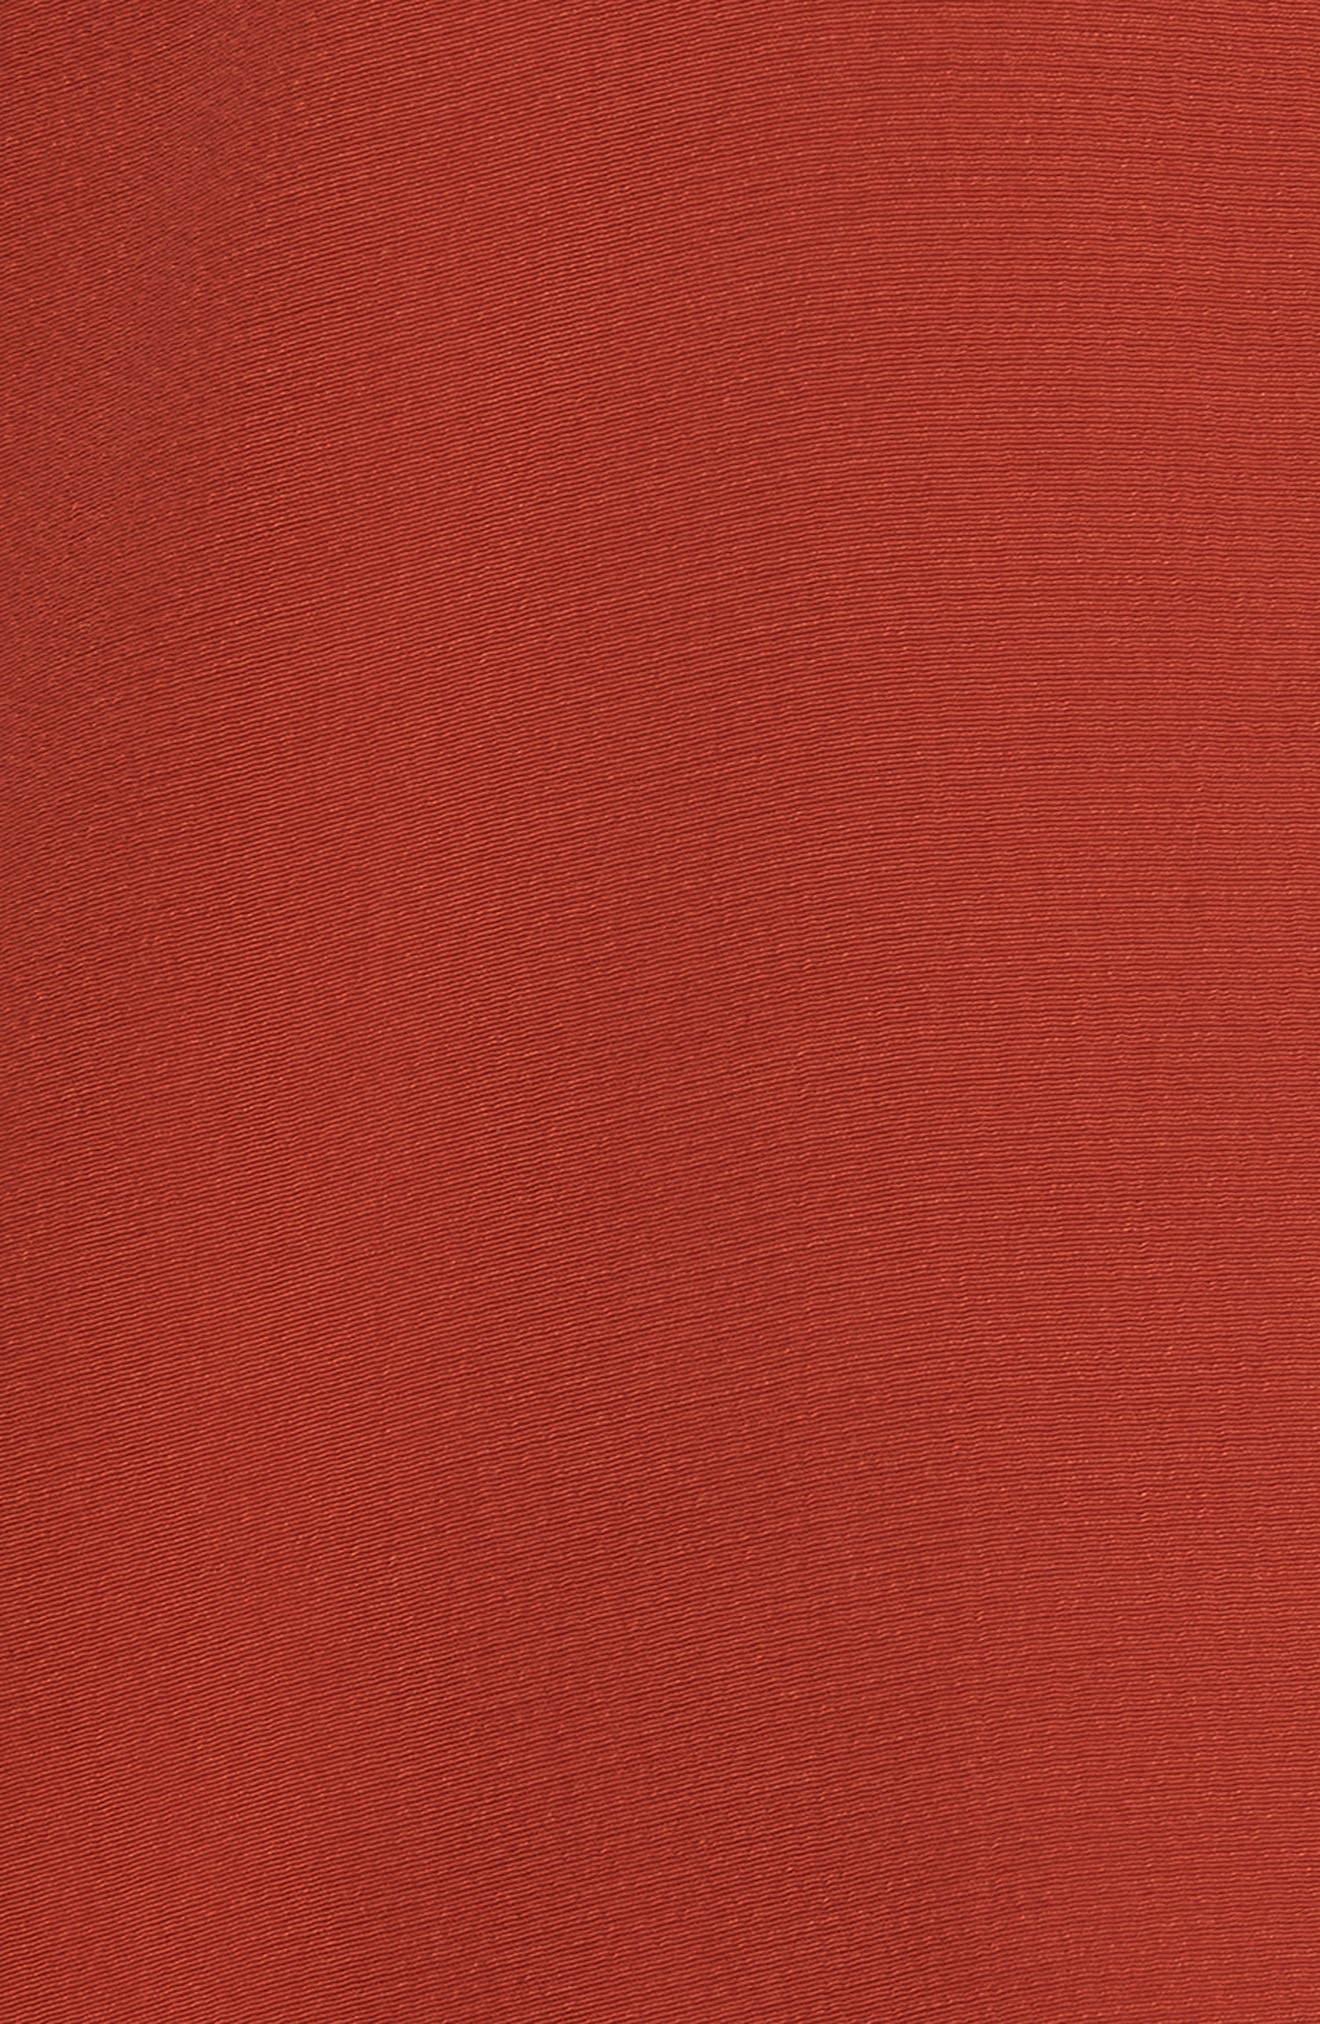 Mandarin Collar Boxy Top,                             Alternate thumbnail 15, color,